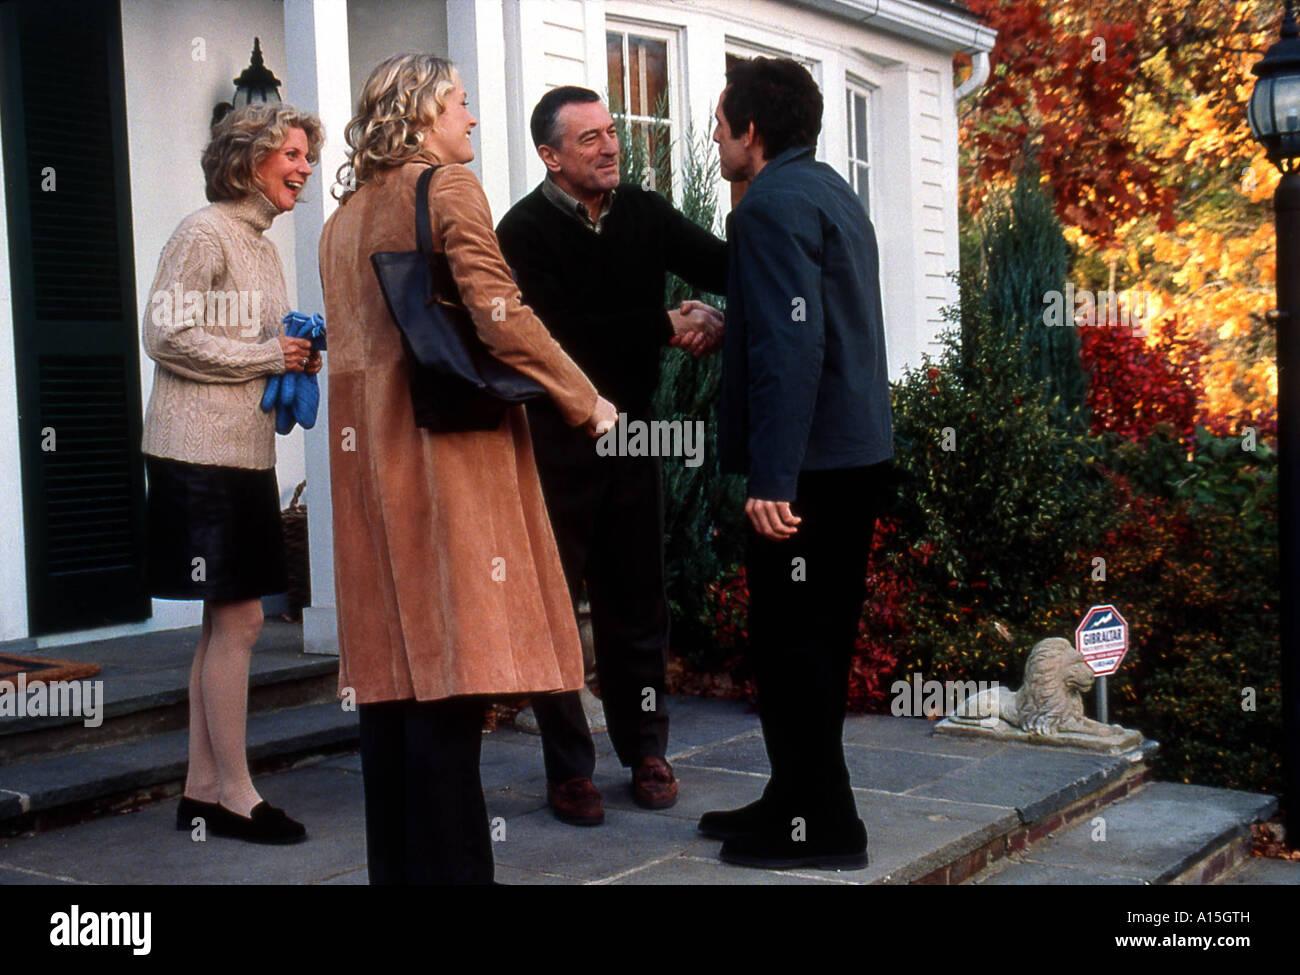 Meet the Parents Year 2000 Director Jay Roach Robert De Niro Teri Polo Blythe Danner Ben Stiller - Stock Image